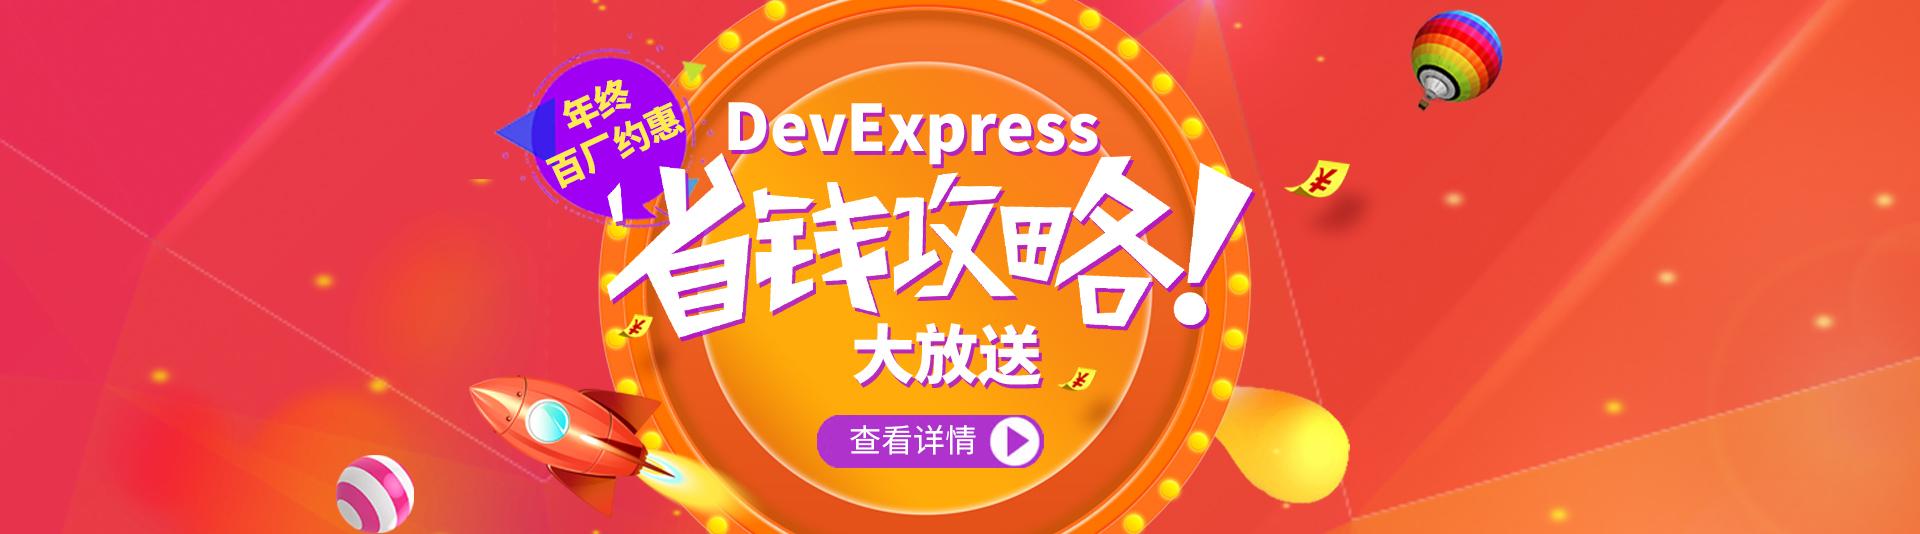 DevExpress省钱攻略大放送